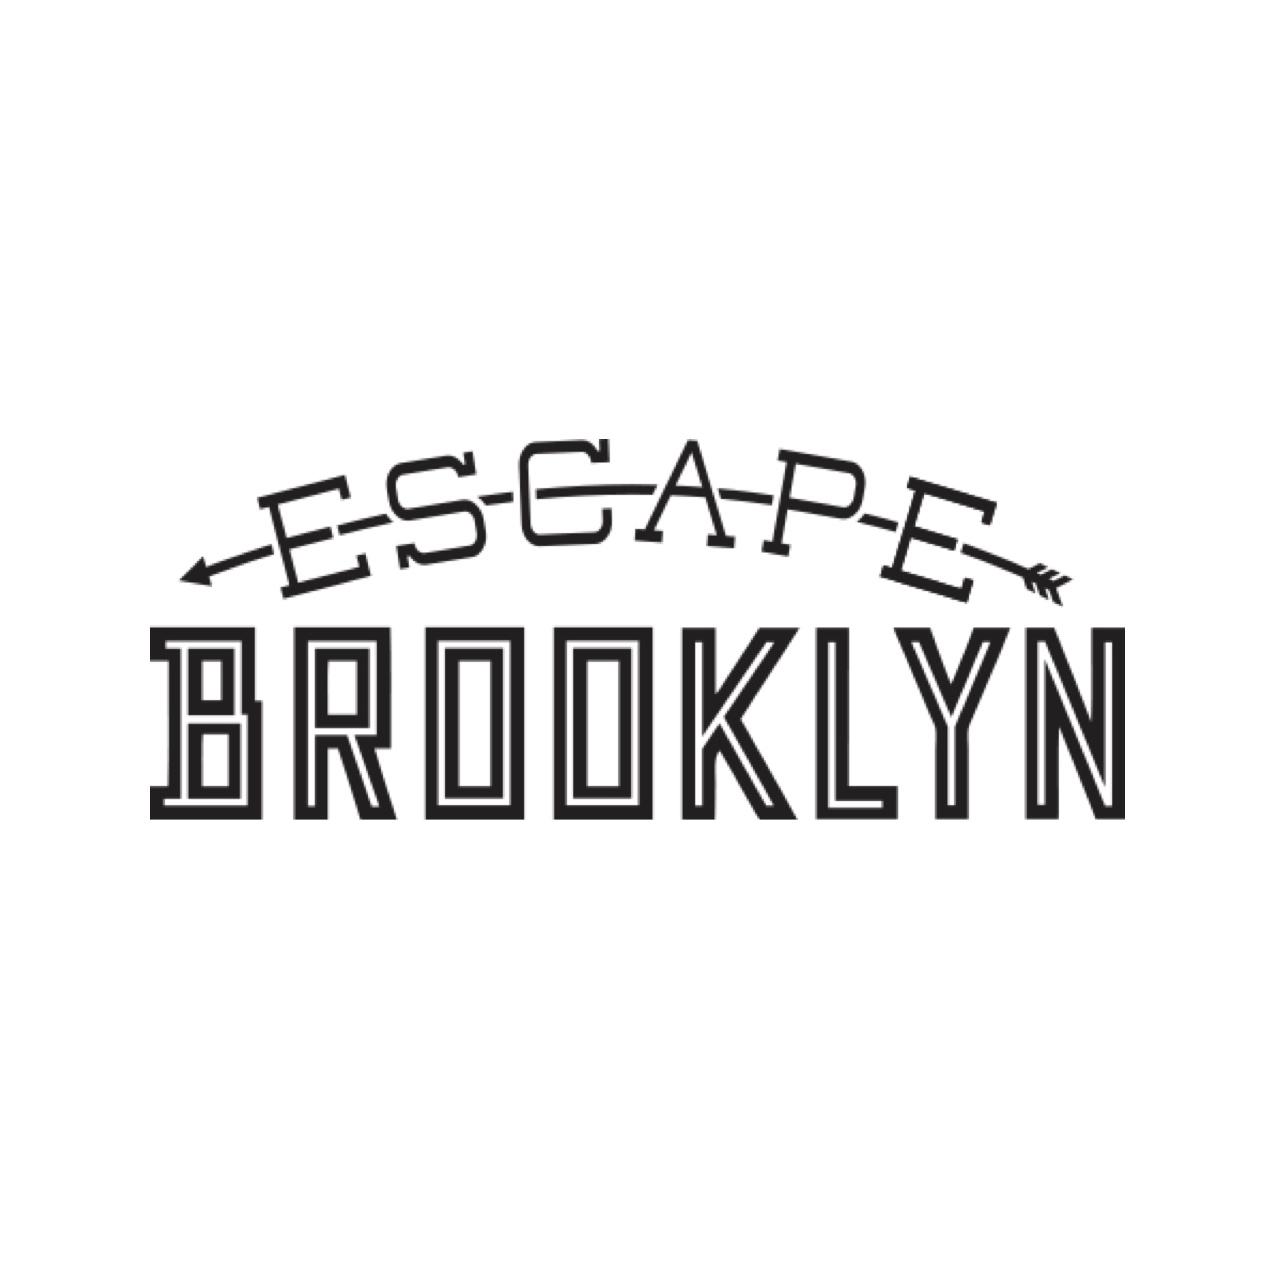 ESCAPE BROOKLYN